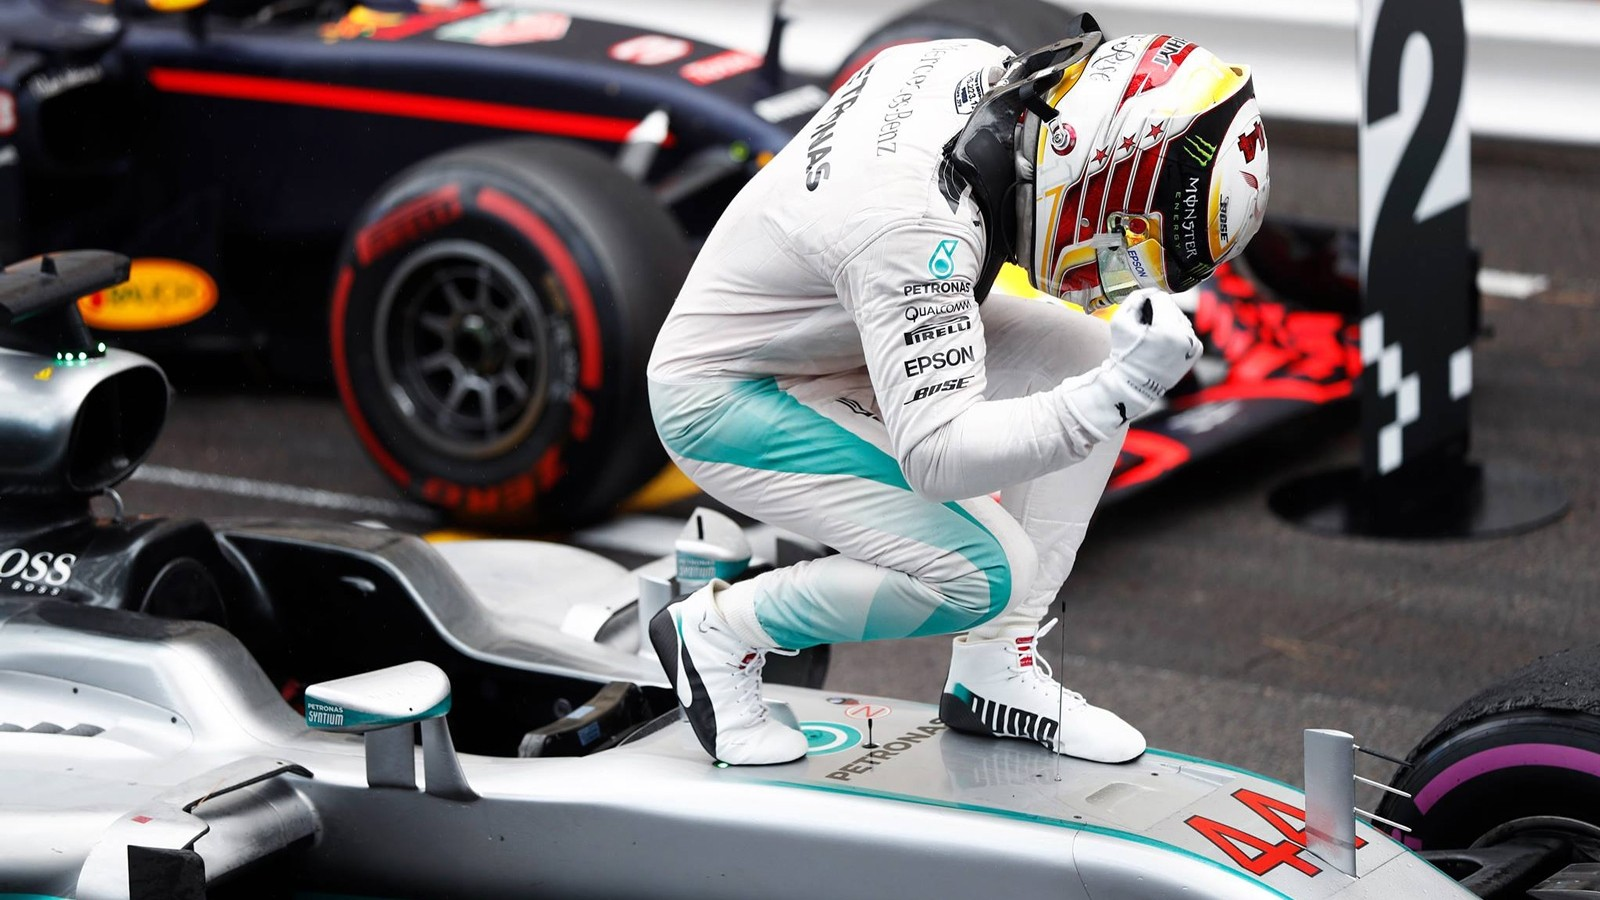 Хэмилтон: На старте гонки я допустил ошибку